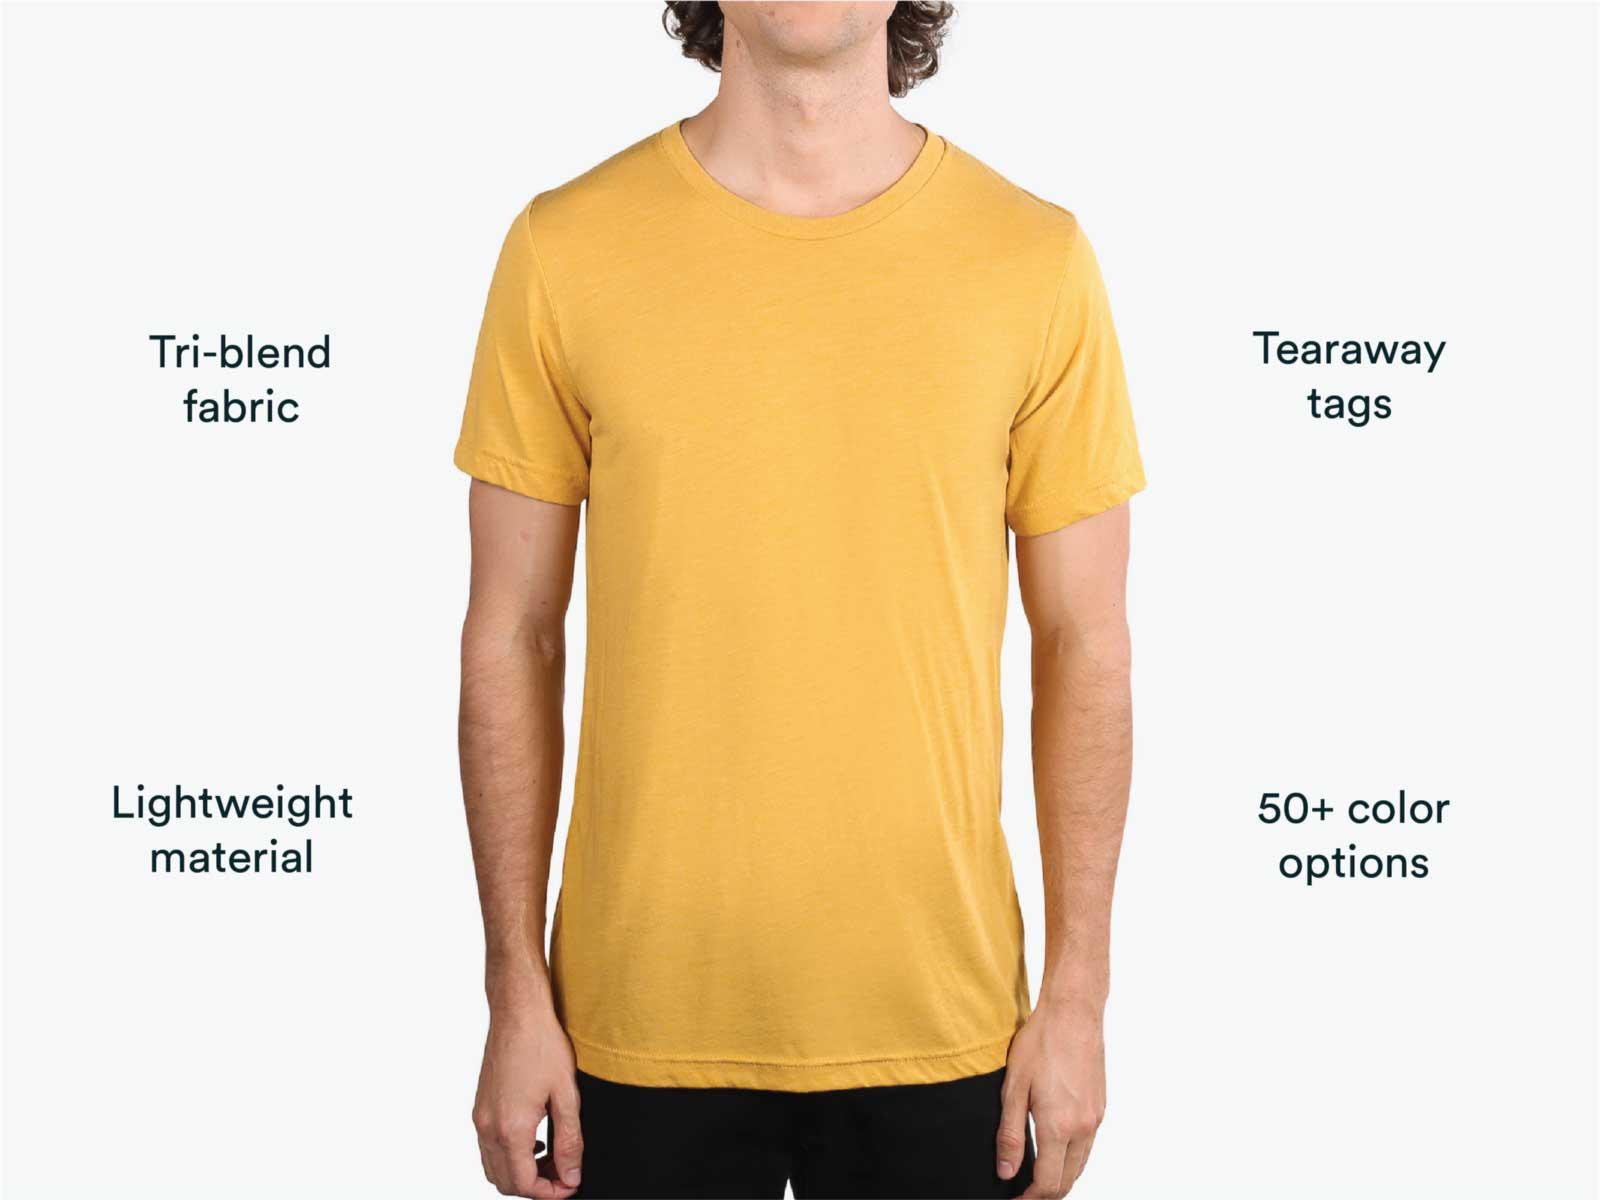 man wearing yellow shirt